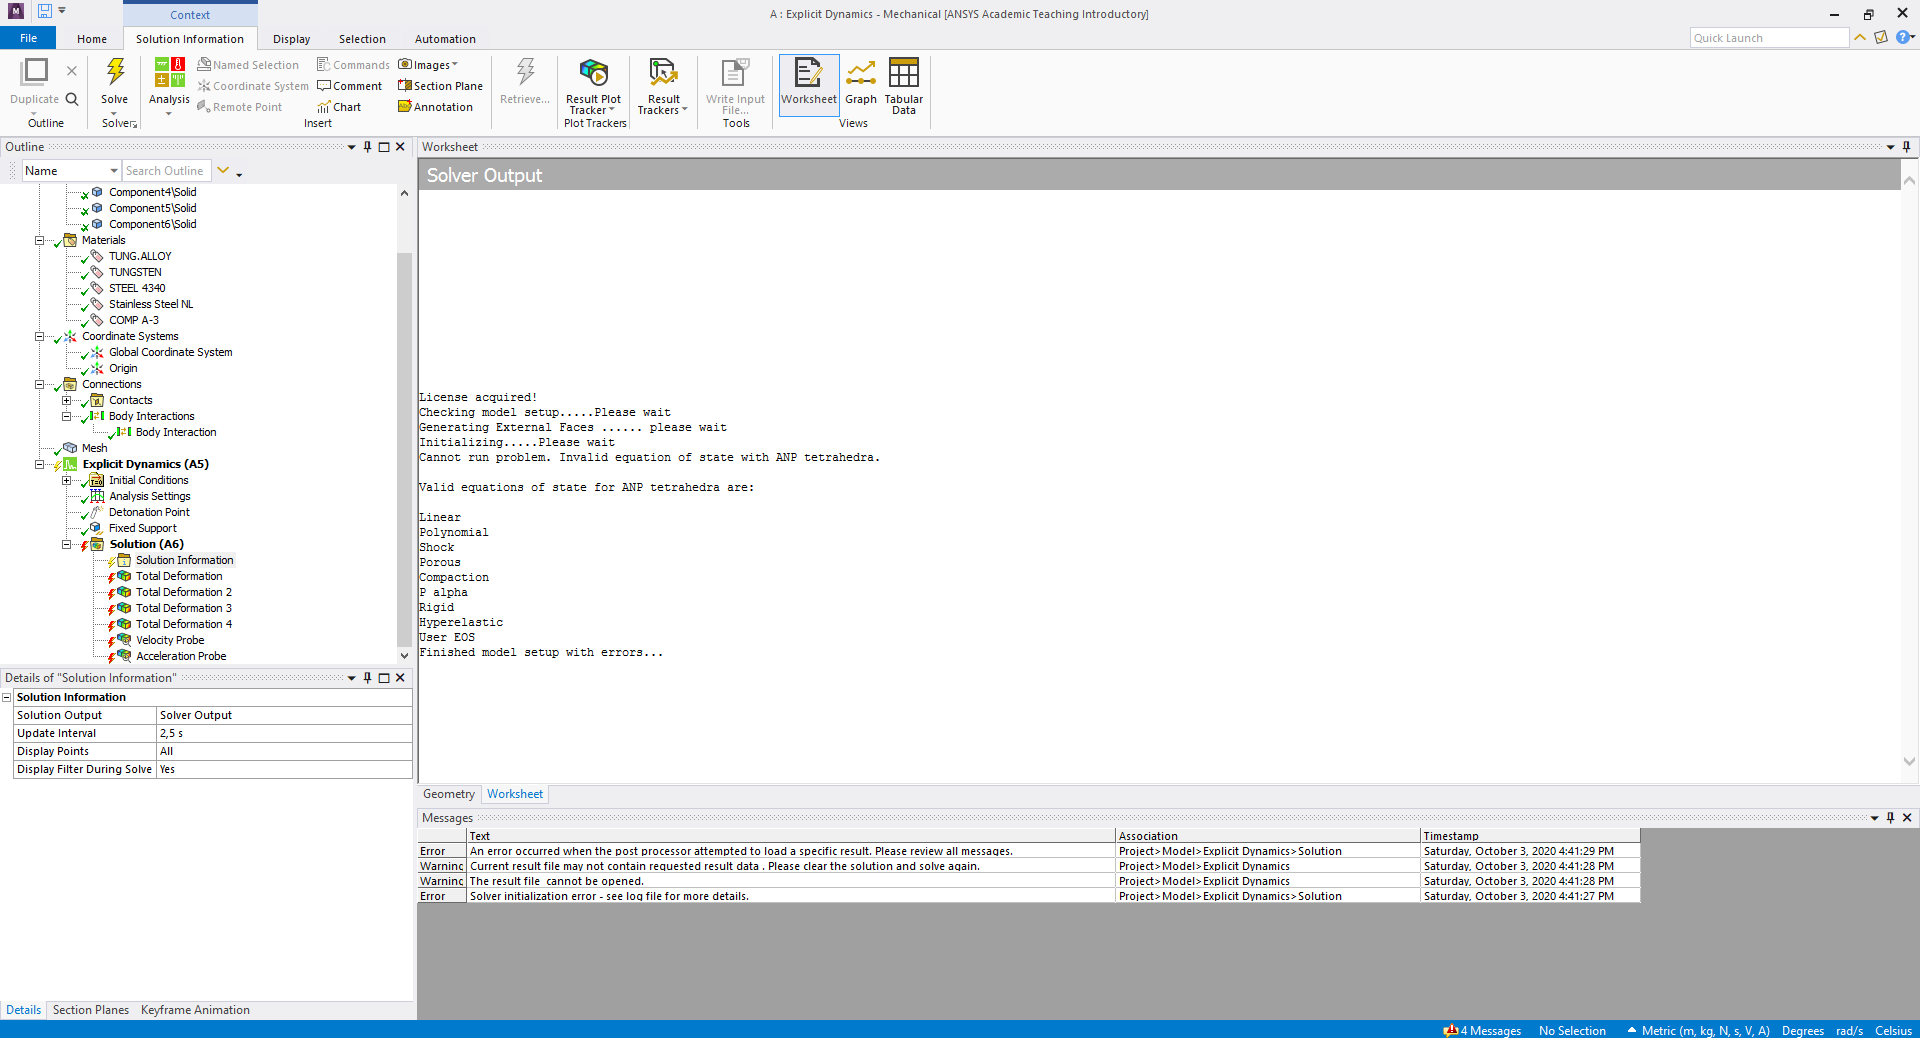 Zrzut ekranu 2020-10-03 164438.png